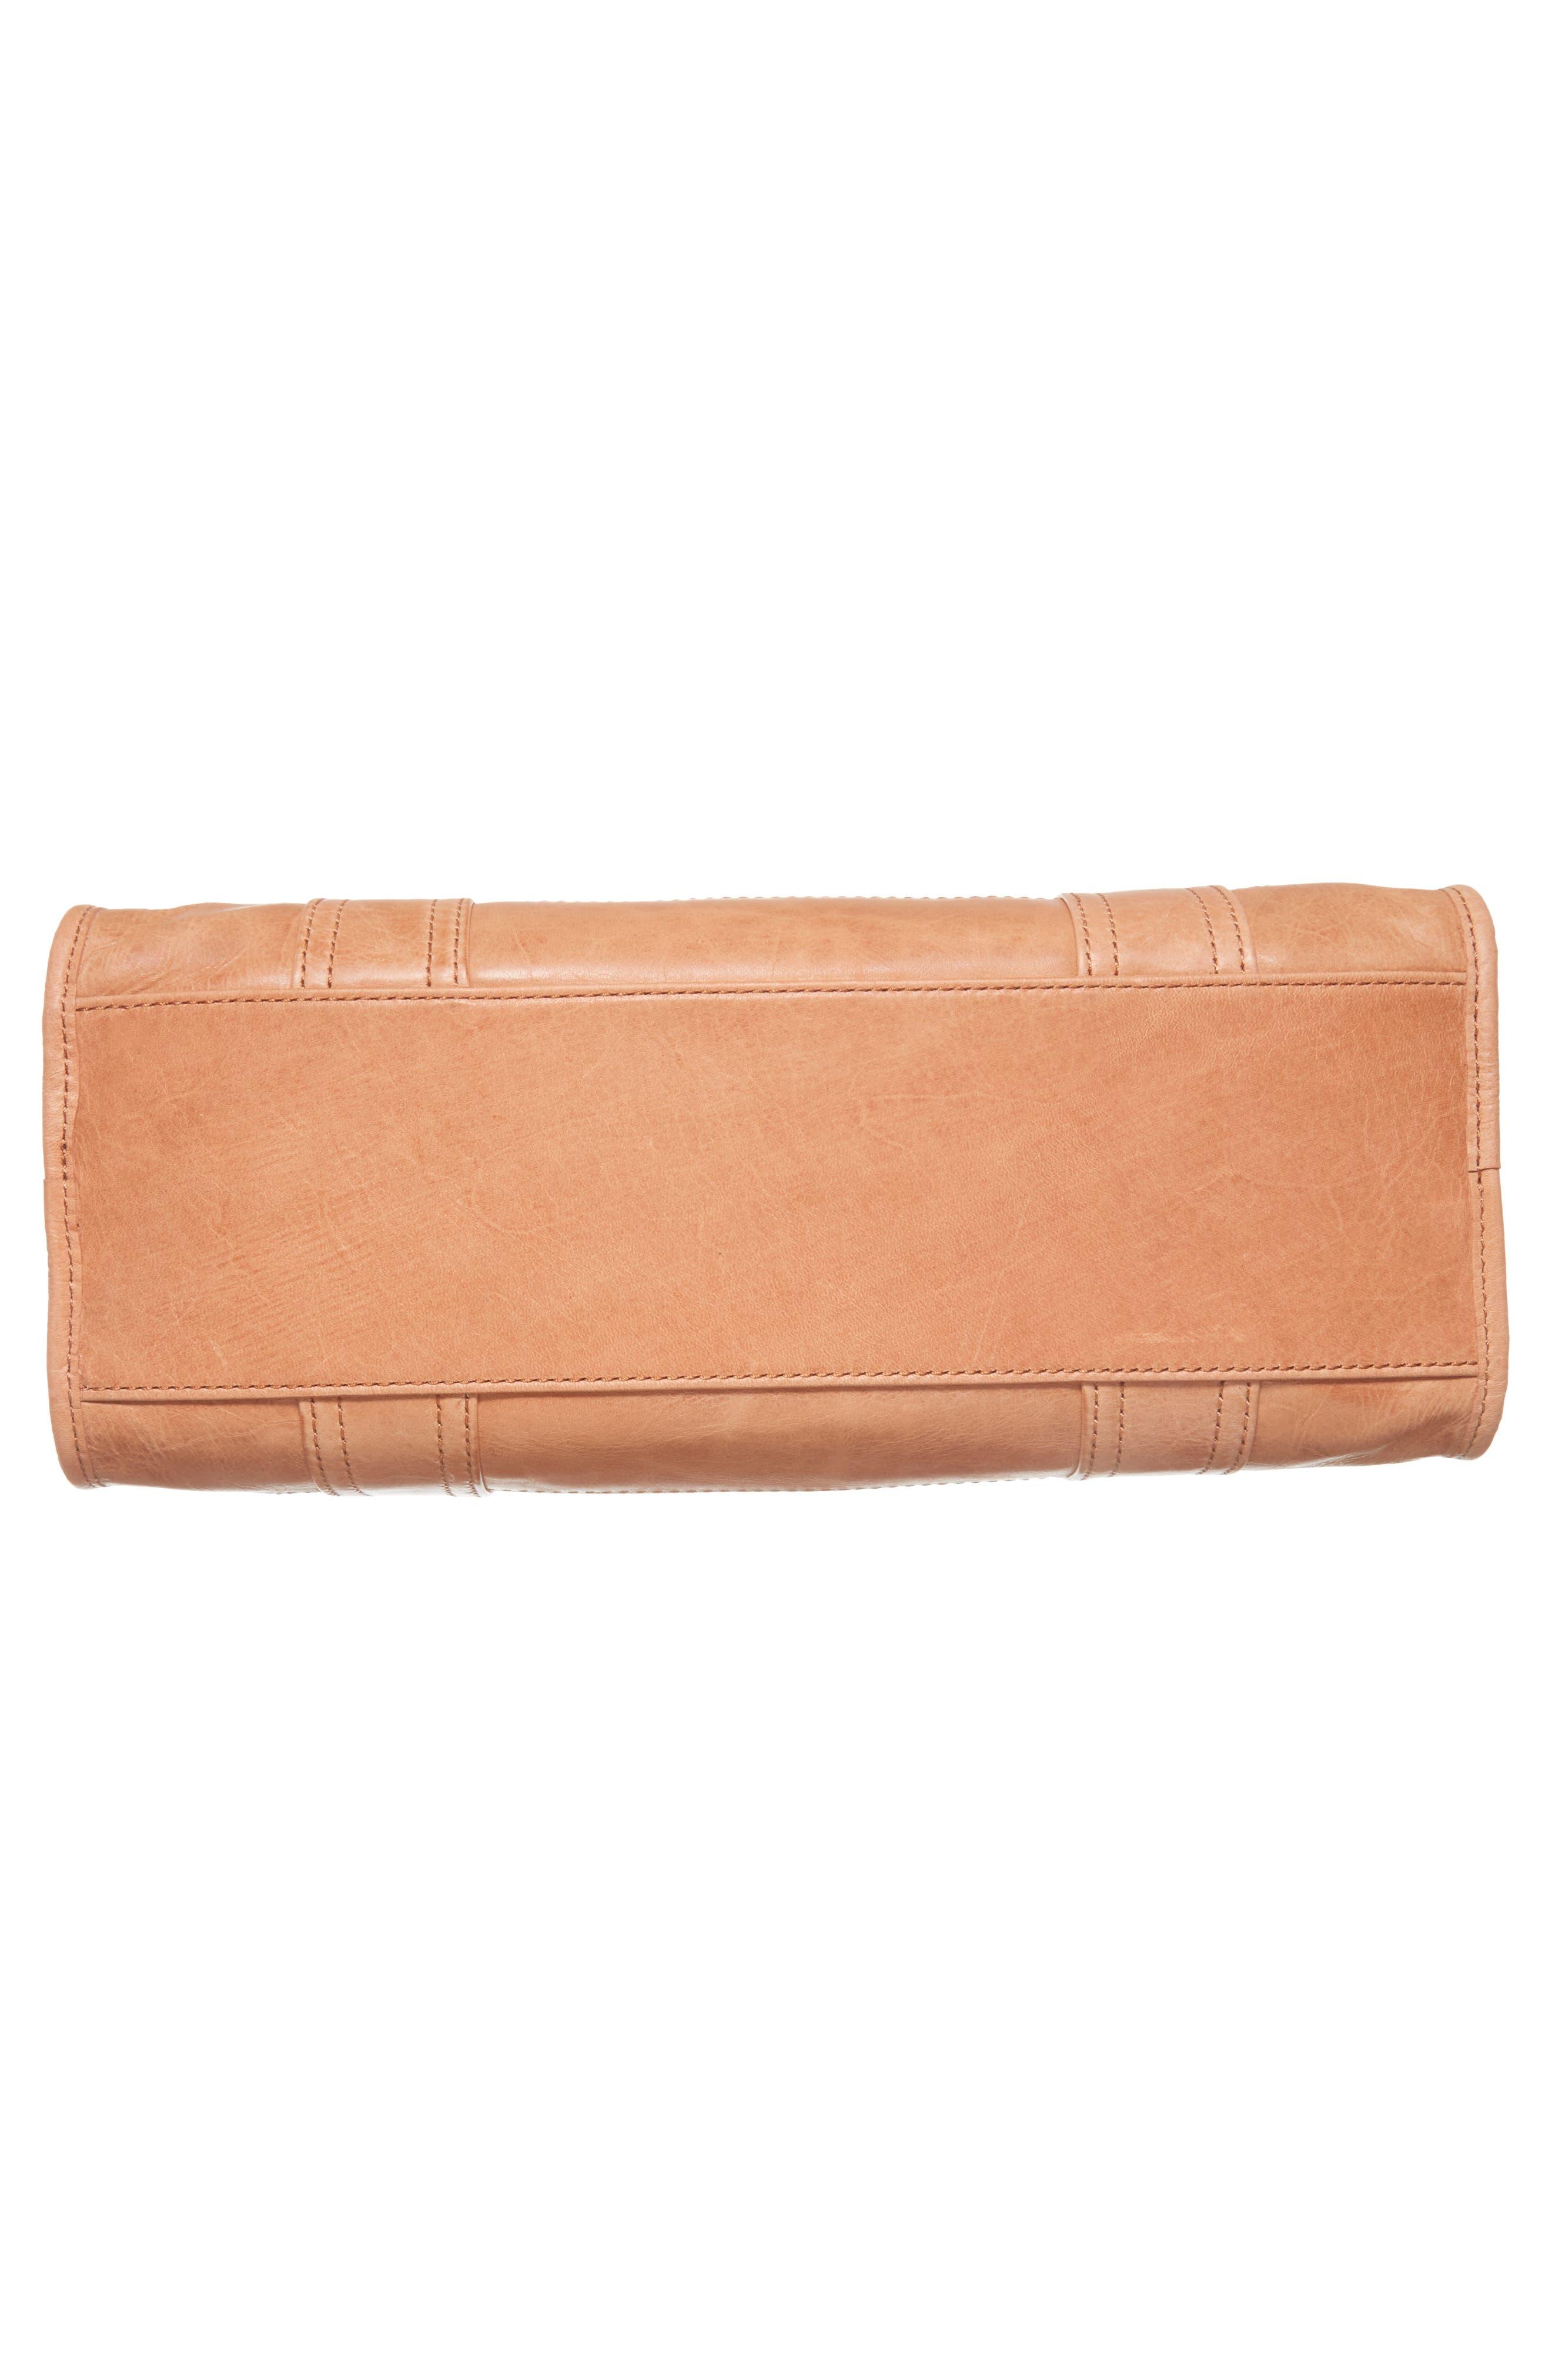 'Melissa' Washed Leather Satchel,                             Alternate thumbnail 6, color,                             DUSTY ROSE